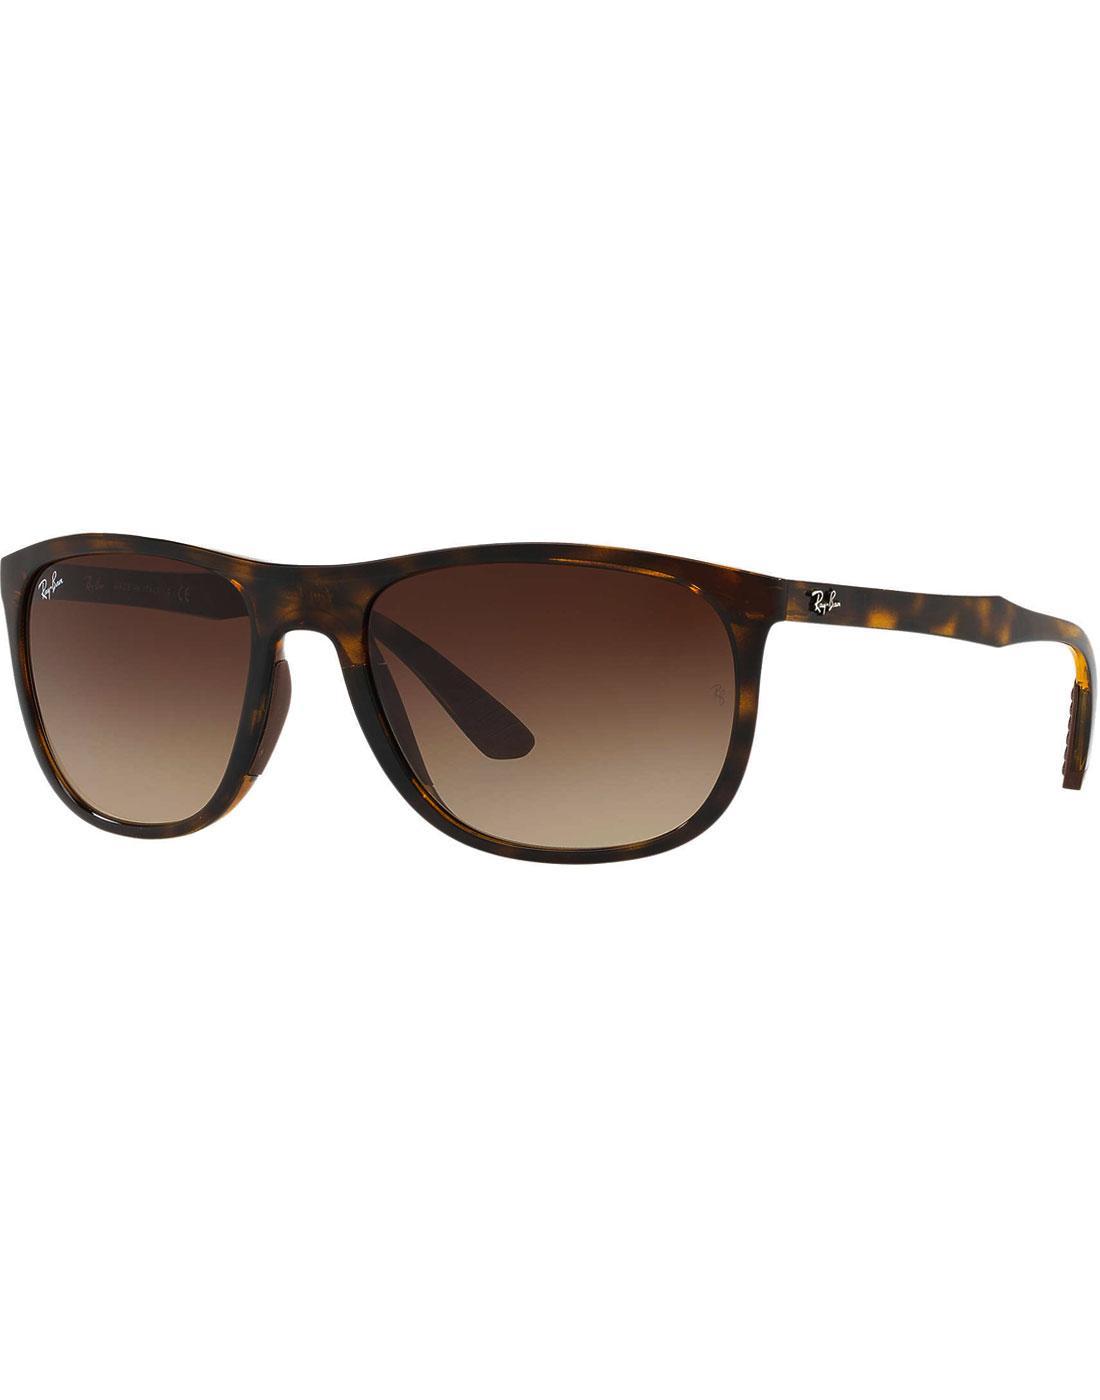 RAY-BAN Retro Wrap Around Wayfarer Sunglasses (H)